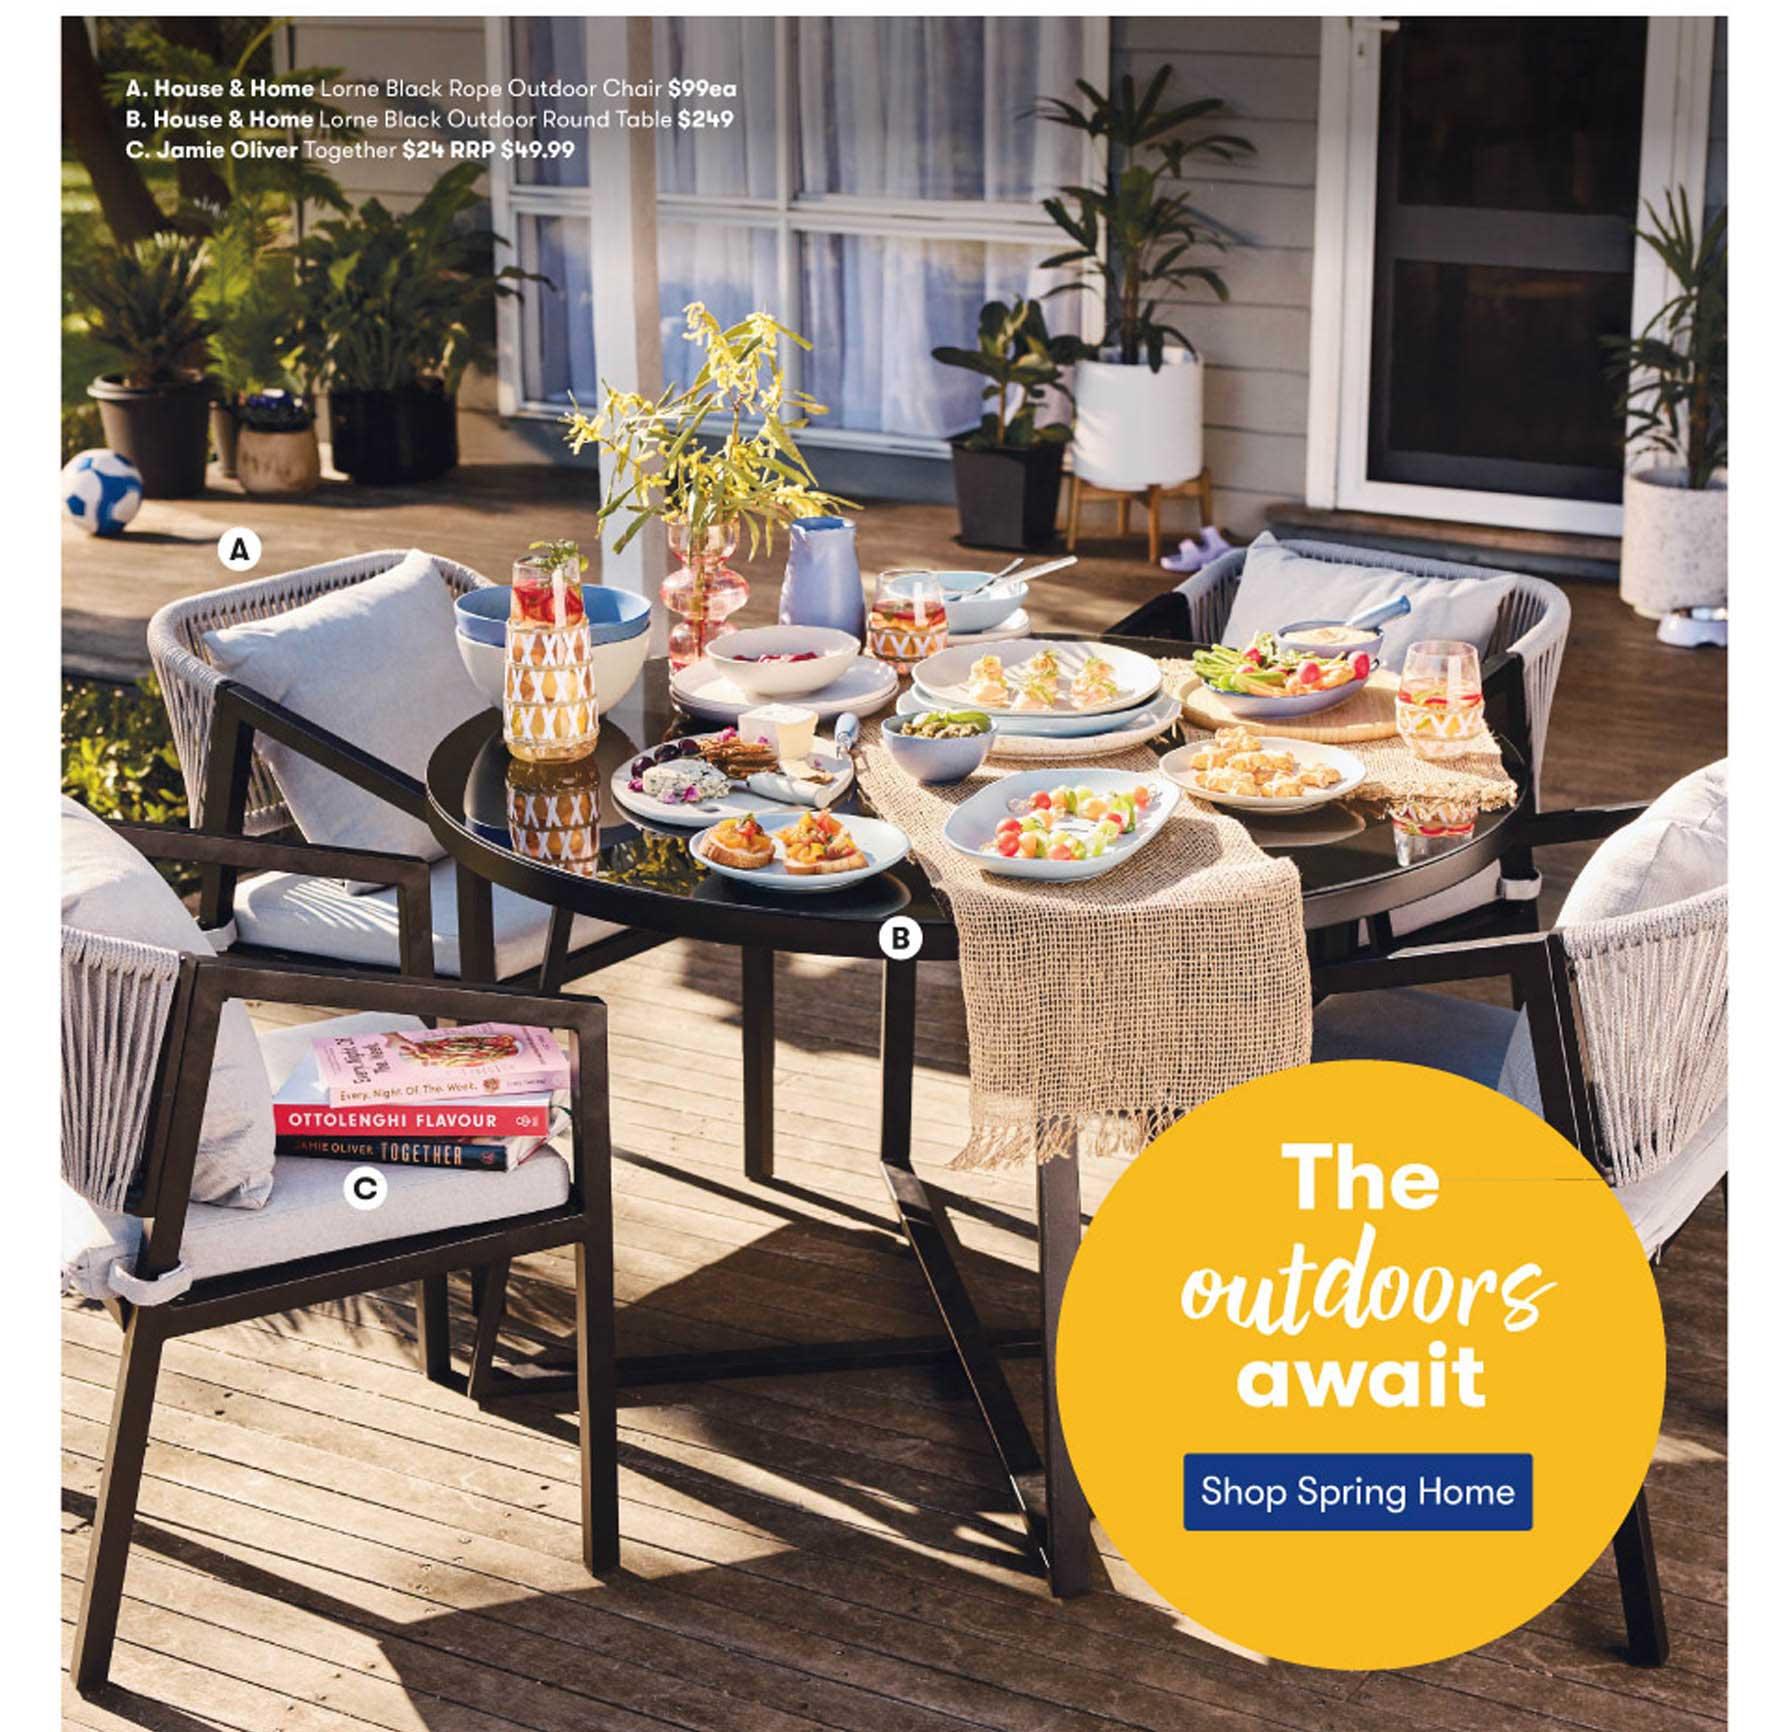 Woolworths House & Home Lorne Black Rope Outdoor Chair, House & Home Lorne Black Outdoor Round Table Or Jaime Oliver Together